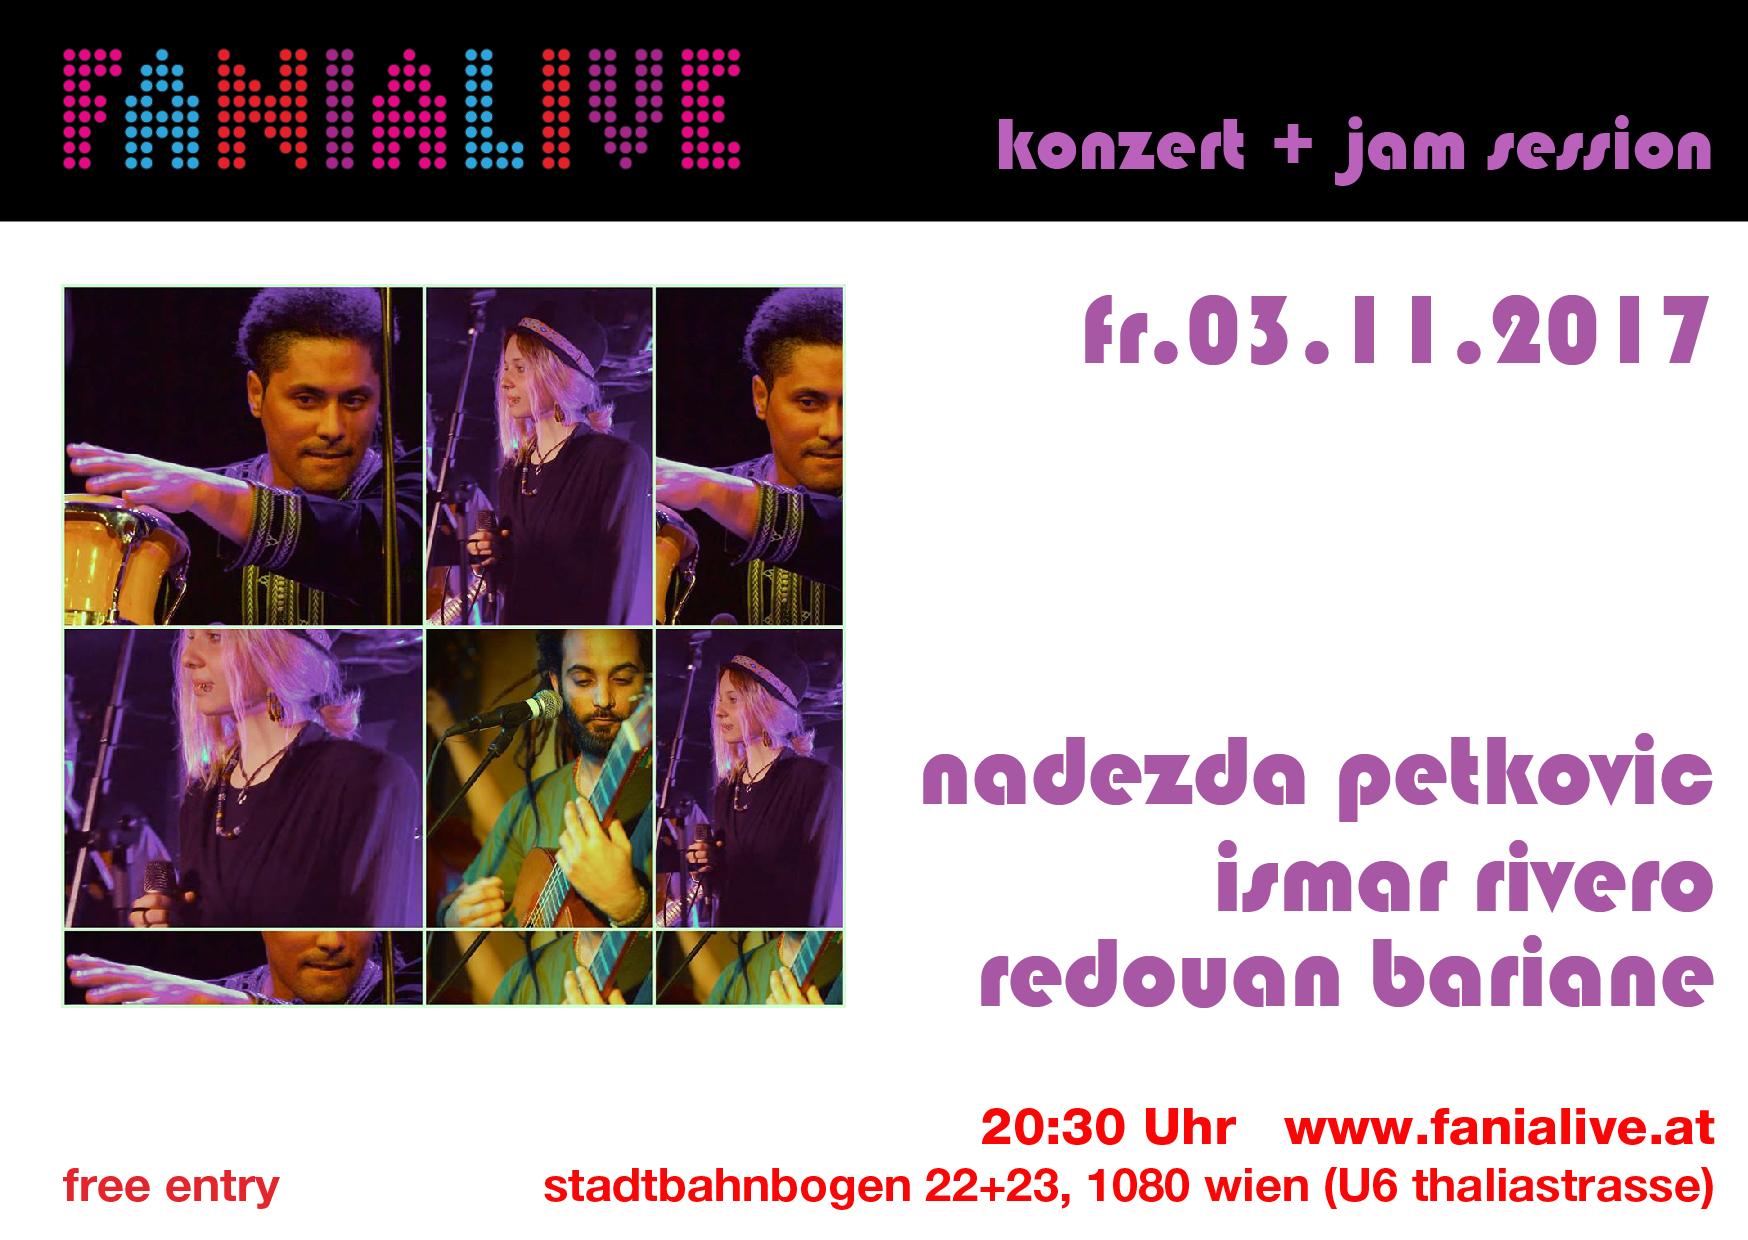 171103_Ismar_Konzert_Jam_Session-01.jpg